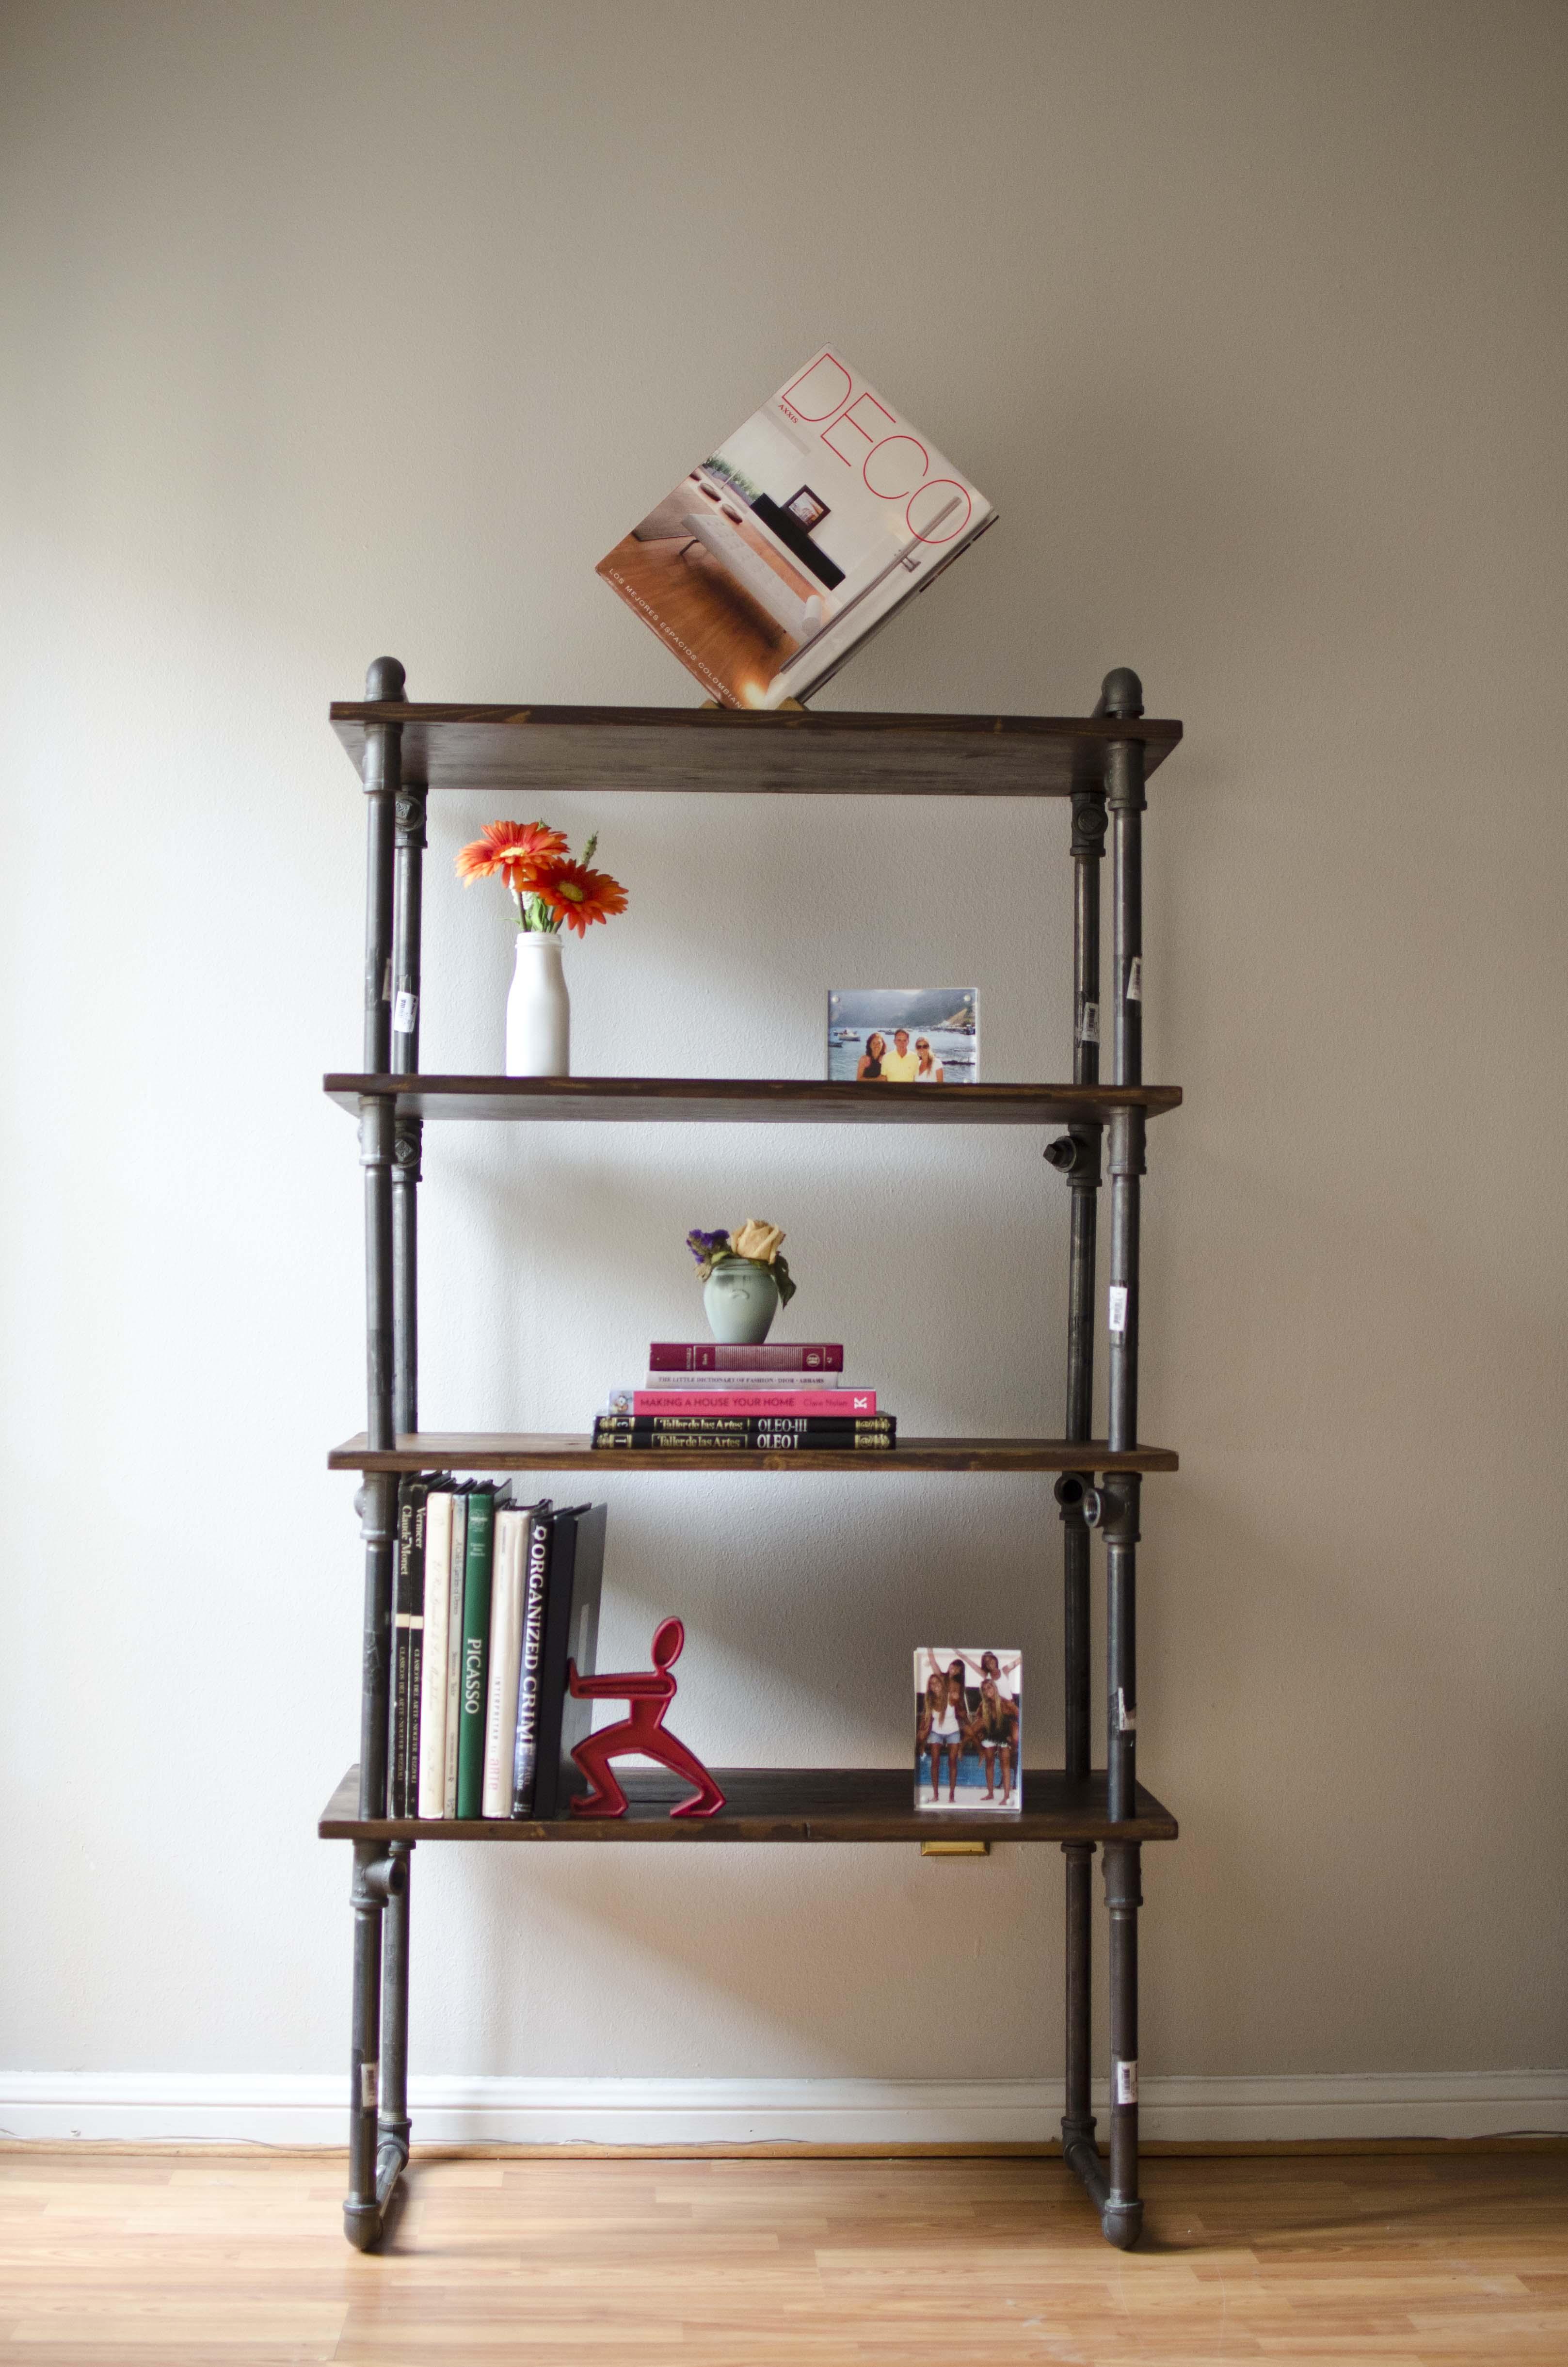 Gas Pipe Furniture Shelf By Juan Boada At Coroflot Com